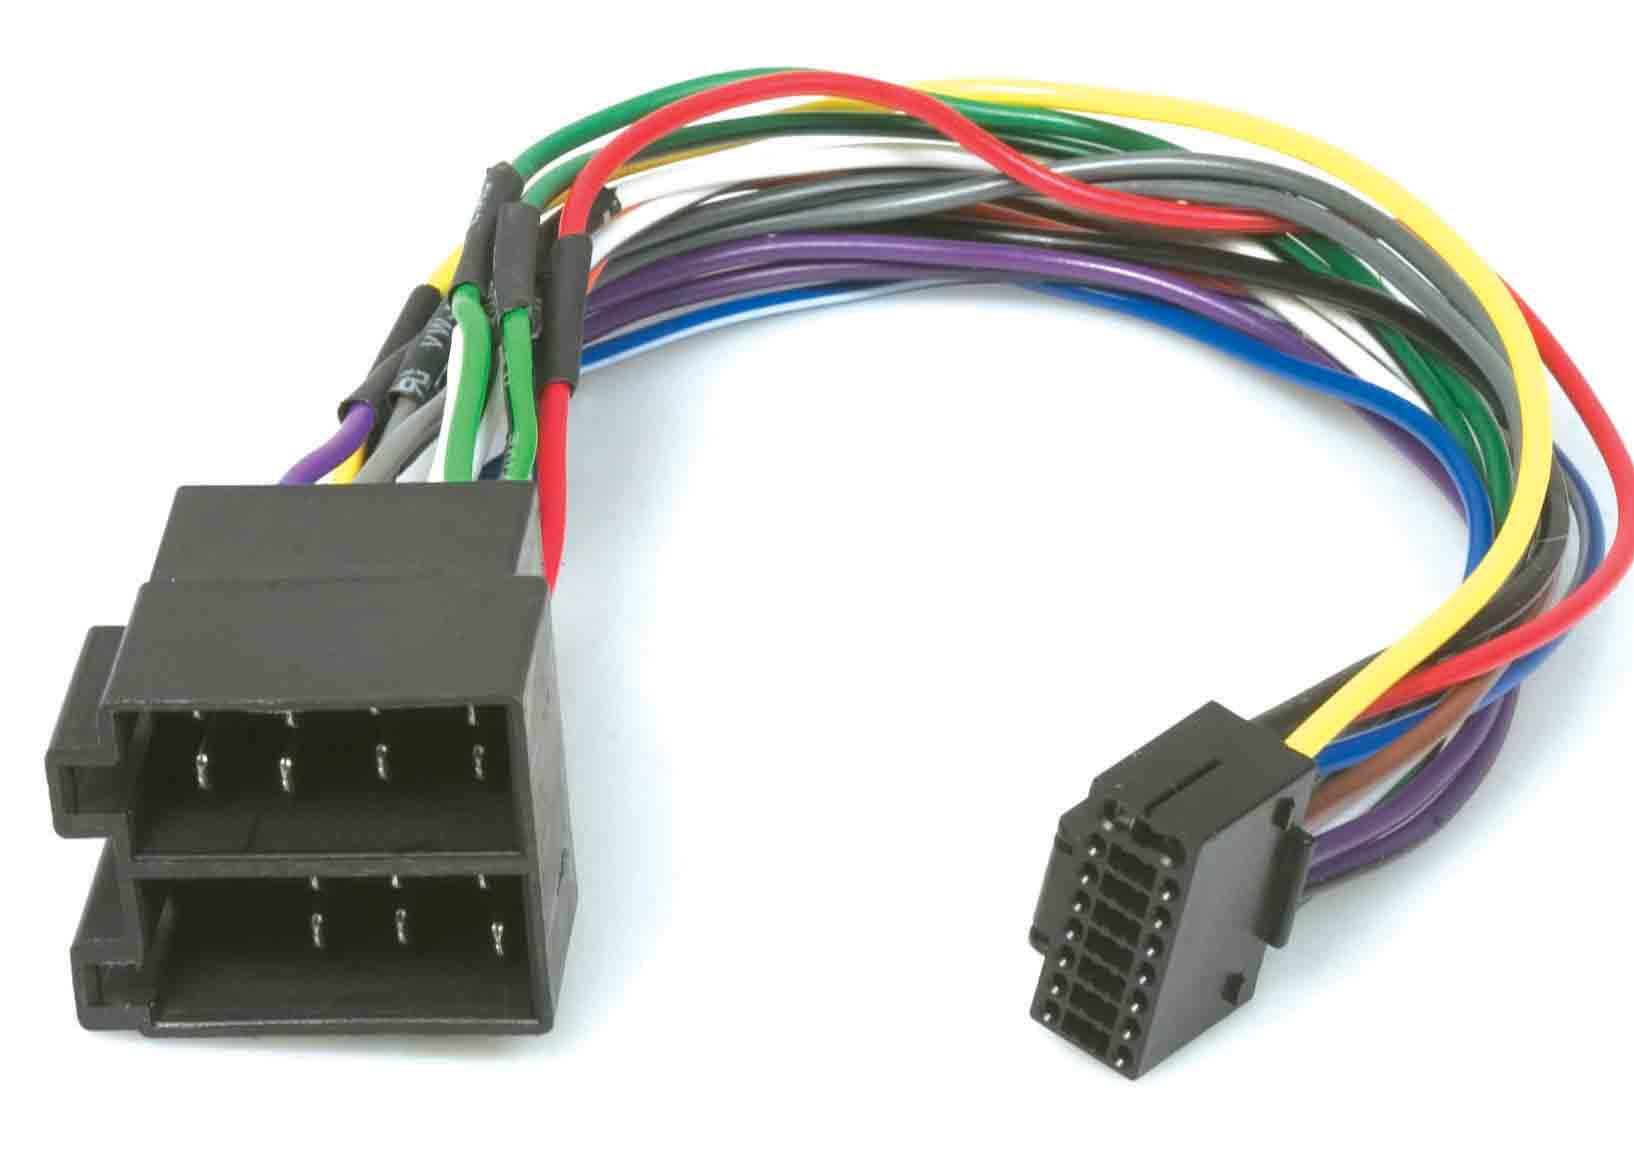 monaco rv wiring diagram wiring diagrams mashups co Cooper 6107 Wiring Diagram monaco rv wiring diagram wiring diagram cooper 6107 wiring diagram